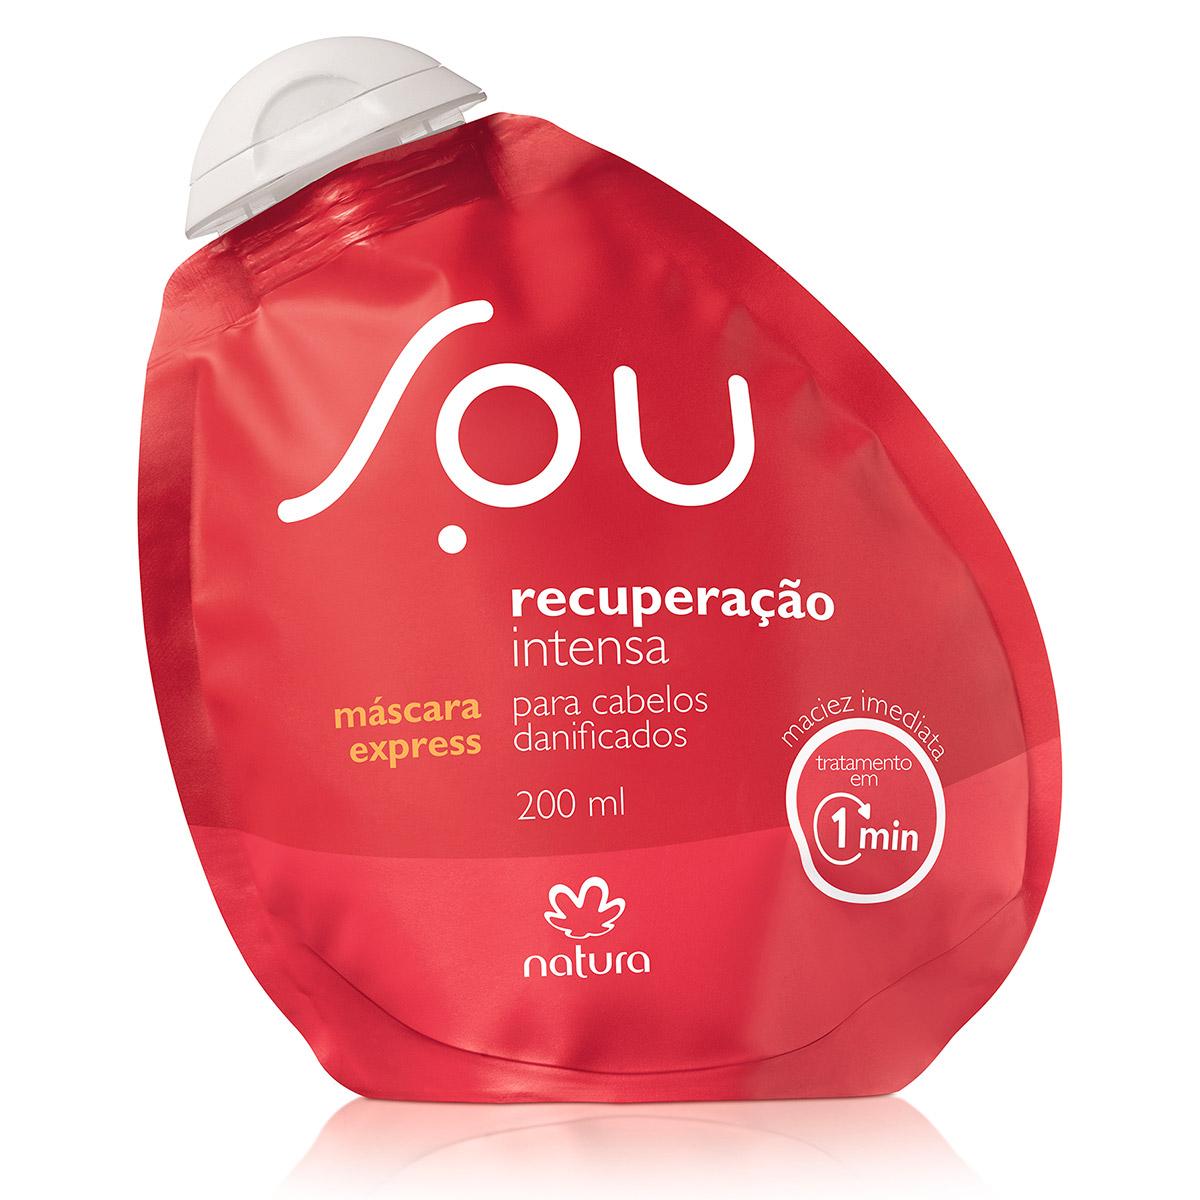 Máscara Express Recuperação Intensa SOU - 200ml - 63971